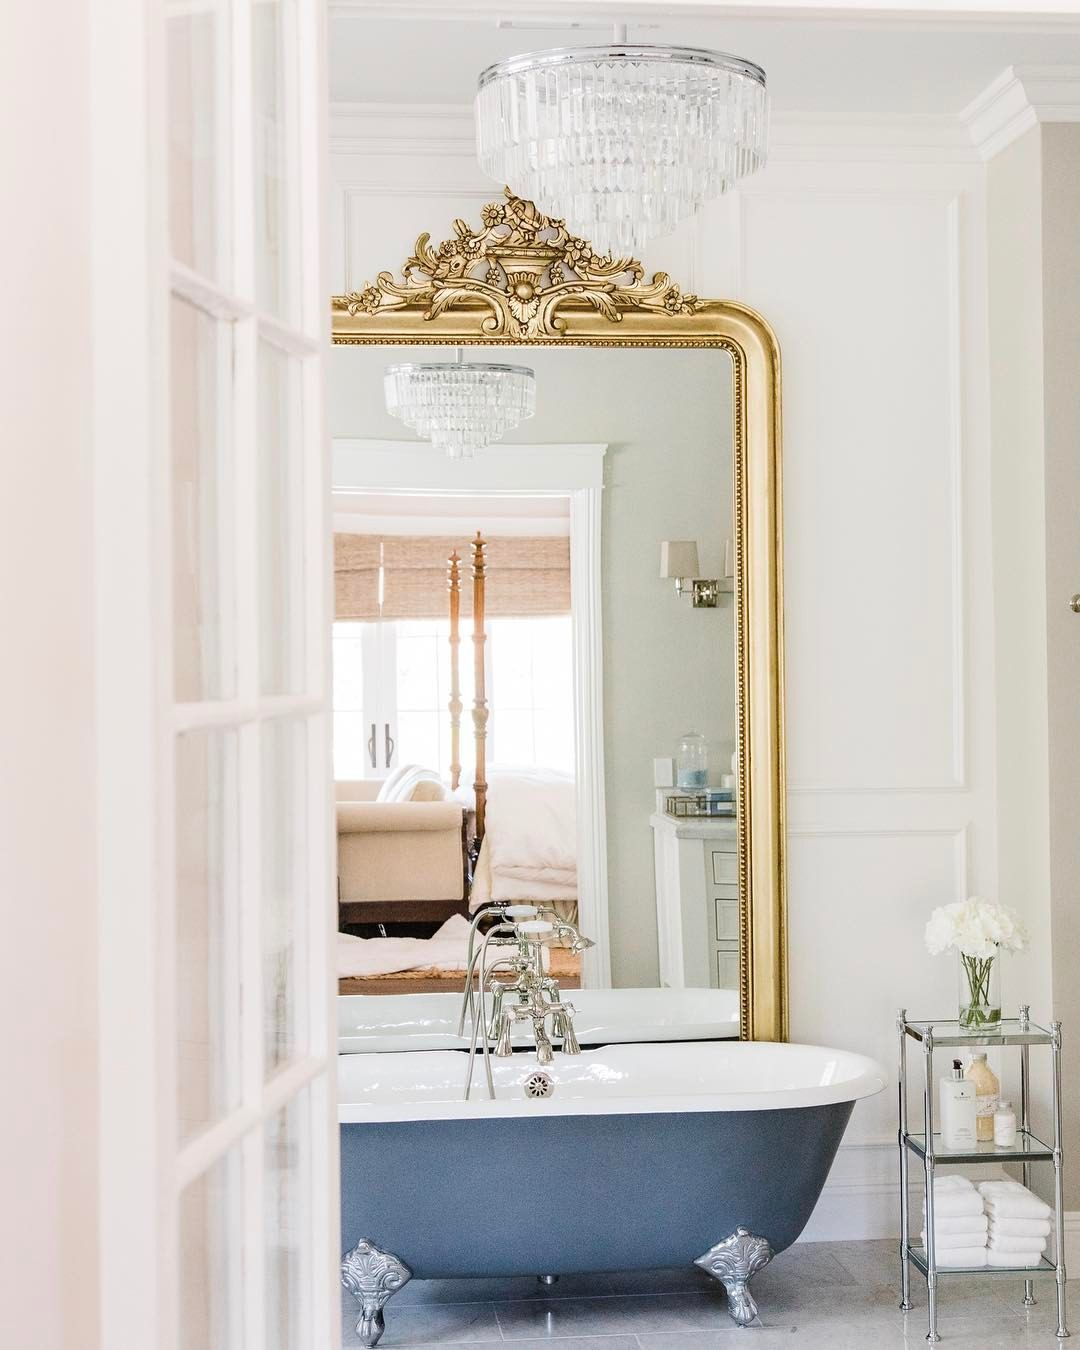 Custom Master Bathroom Designed And Built By Rafterhouse Located In Sunny Phoenix AZ